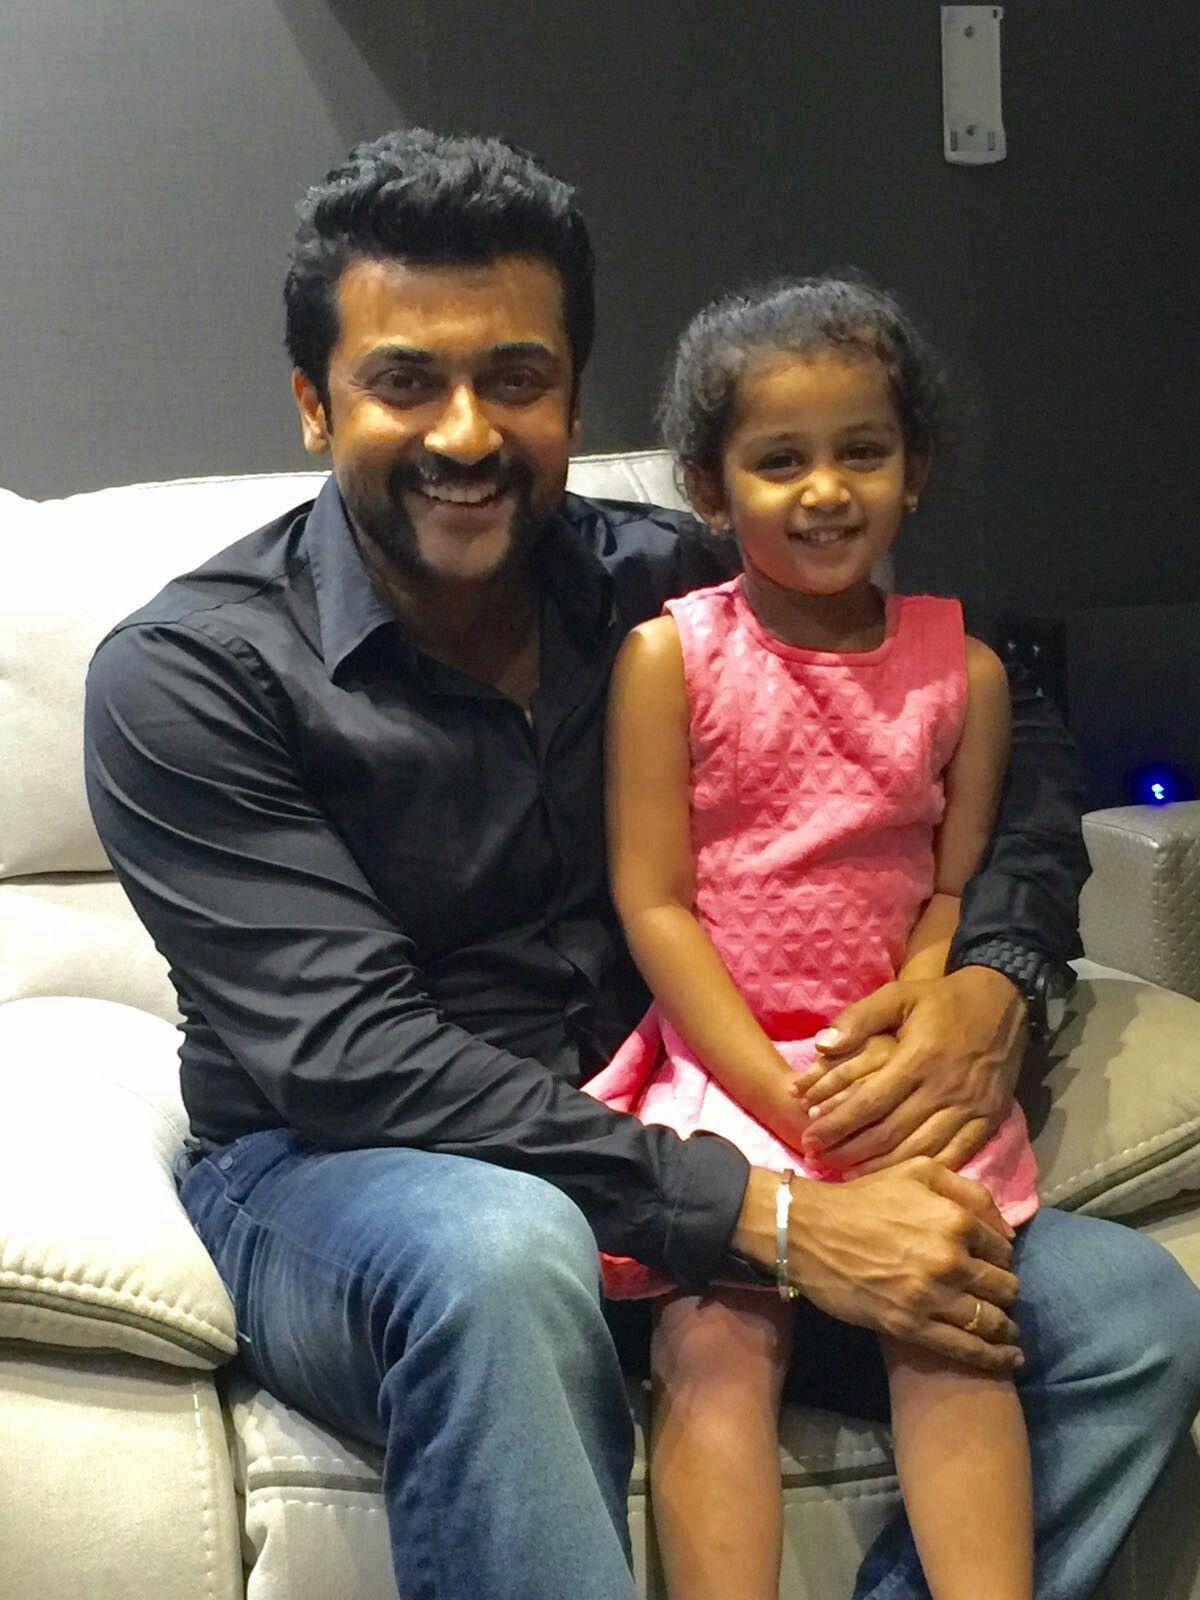 suriya with singer krish s daughter shivhiya stills and images